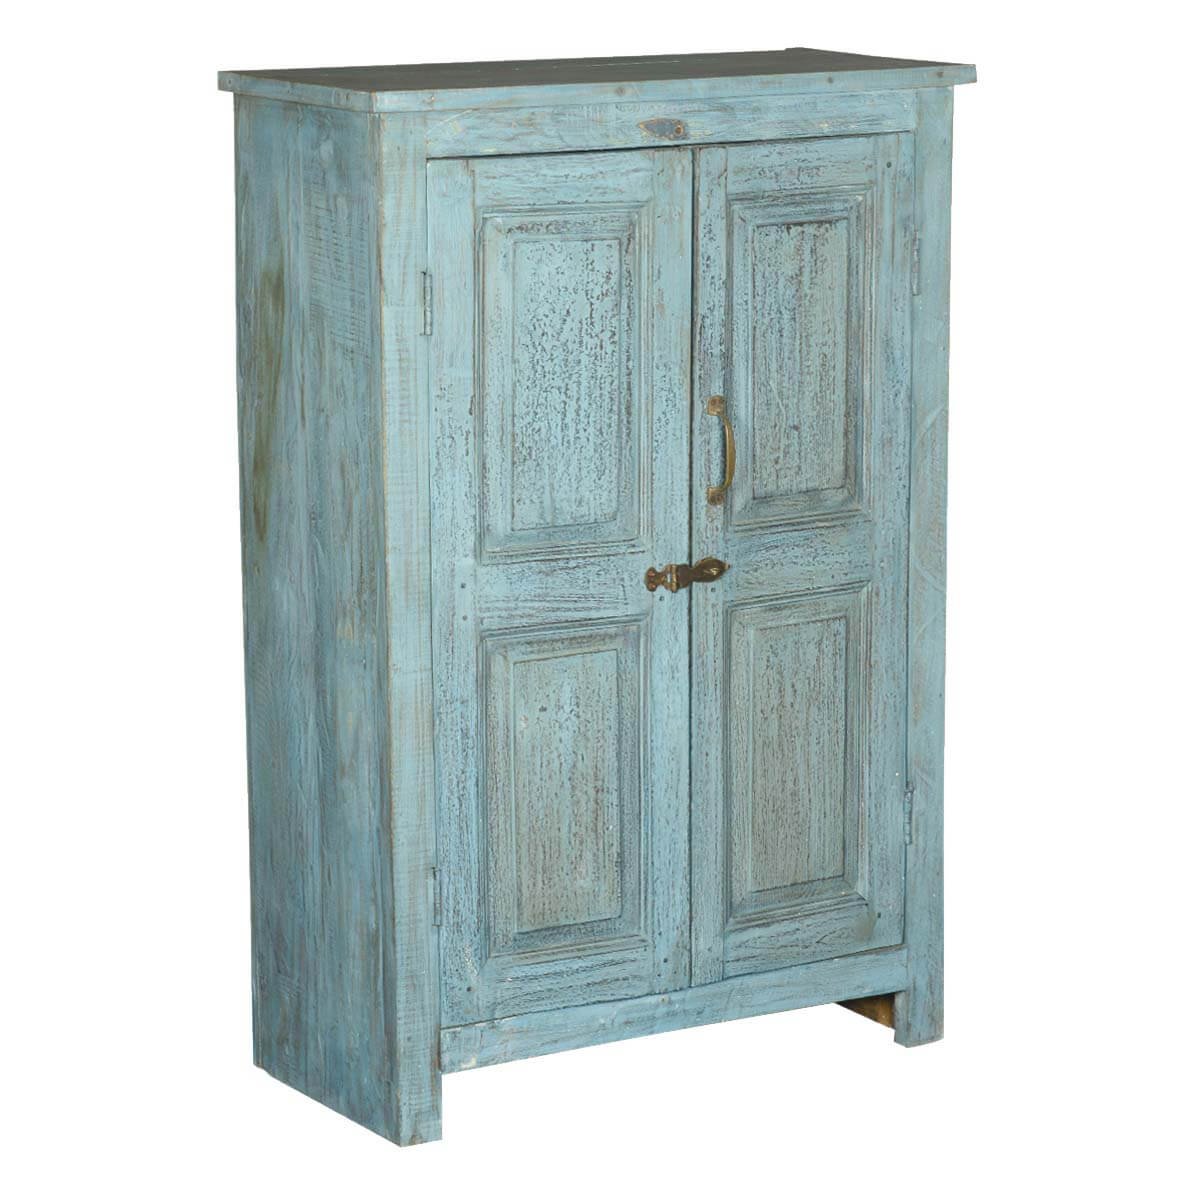 Distressed Blue 2 Door Reclaimed Wood Storage Cabinet